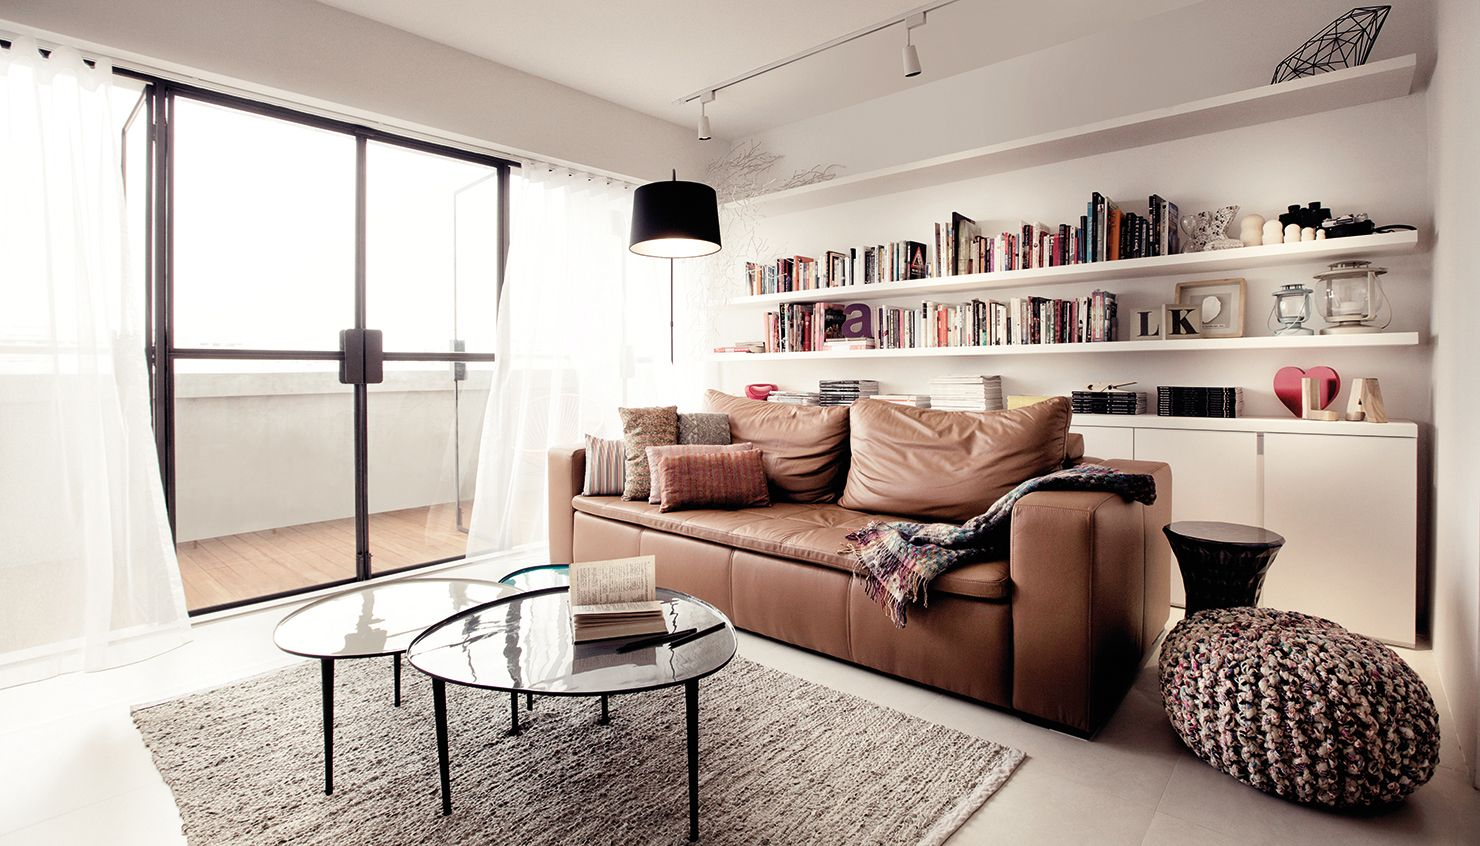 0932 Design Consultant Photo 6 Of 10 Home Decor Singapore Sofa Background Idea Interior Design Bedroom Interior Design Interior Design Help